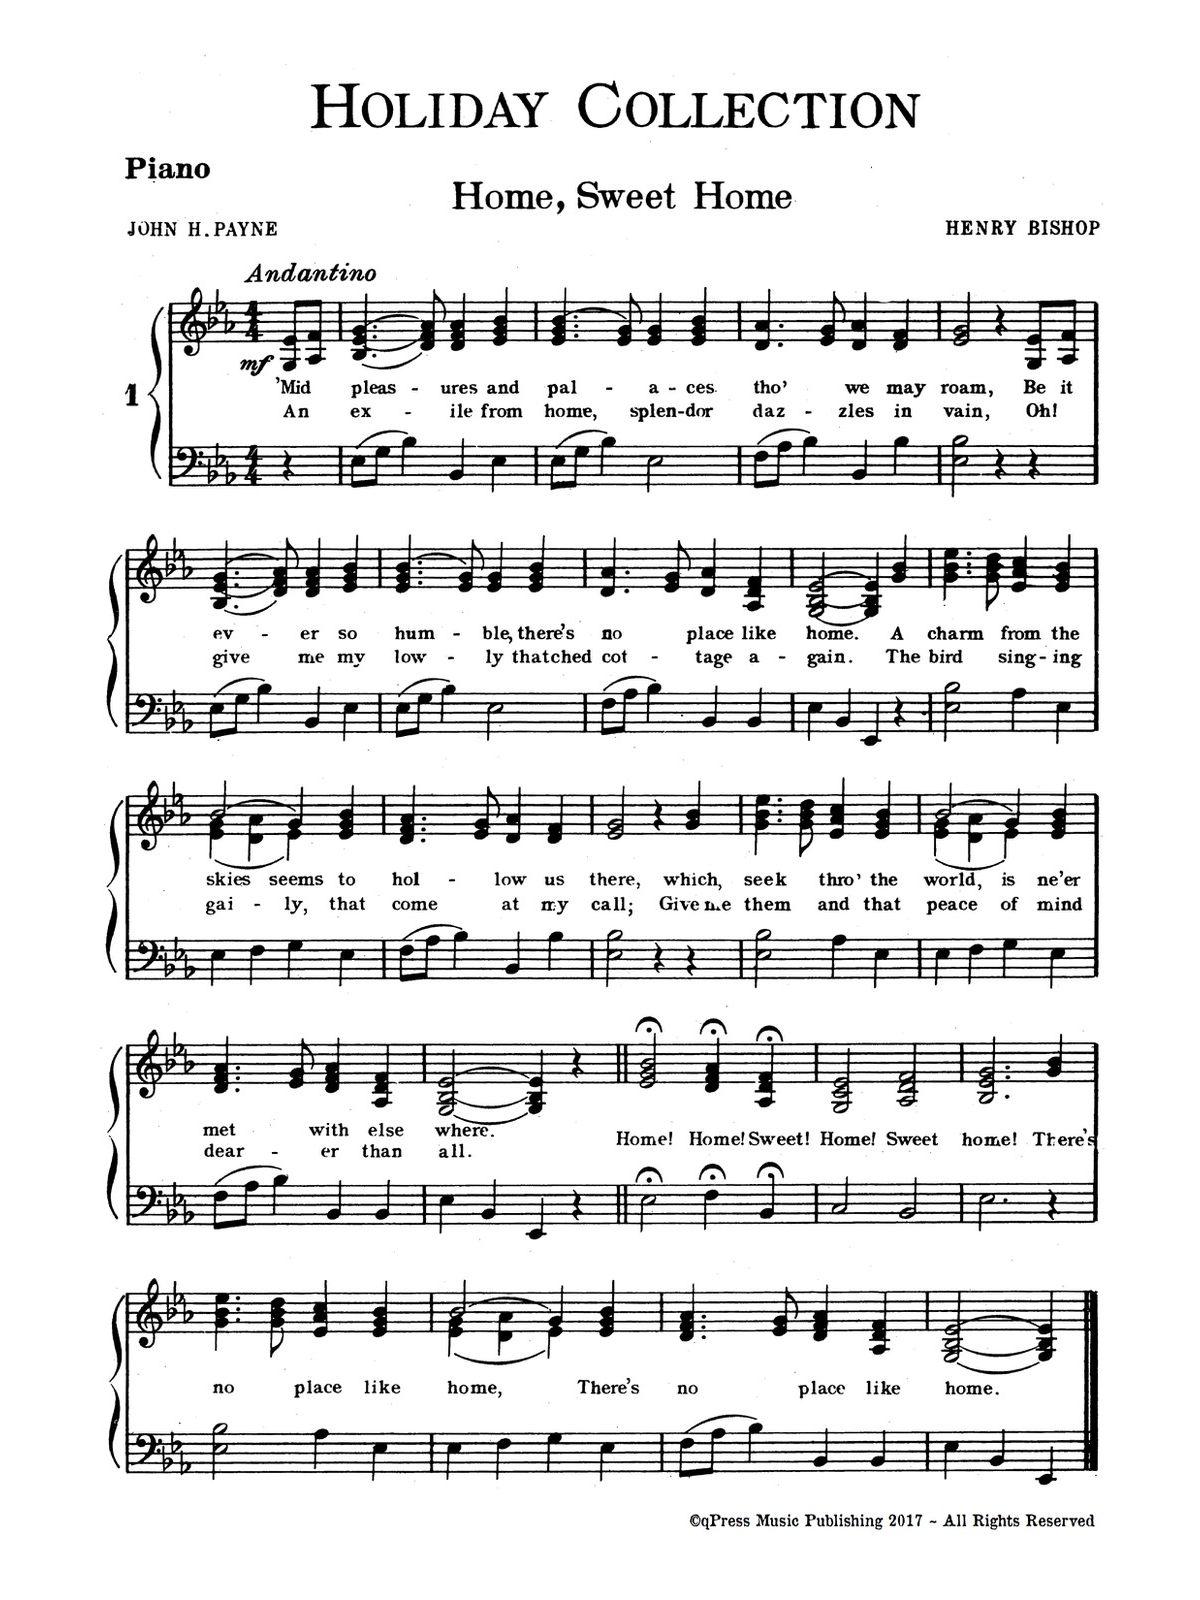 Various, Holiday Collection (59 Carols, Hymns, and Airs)-p081